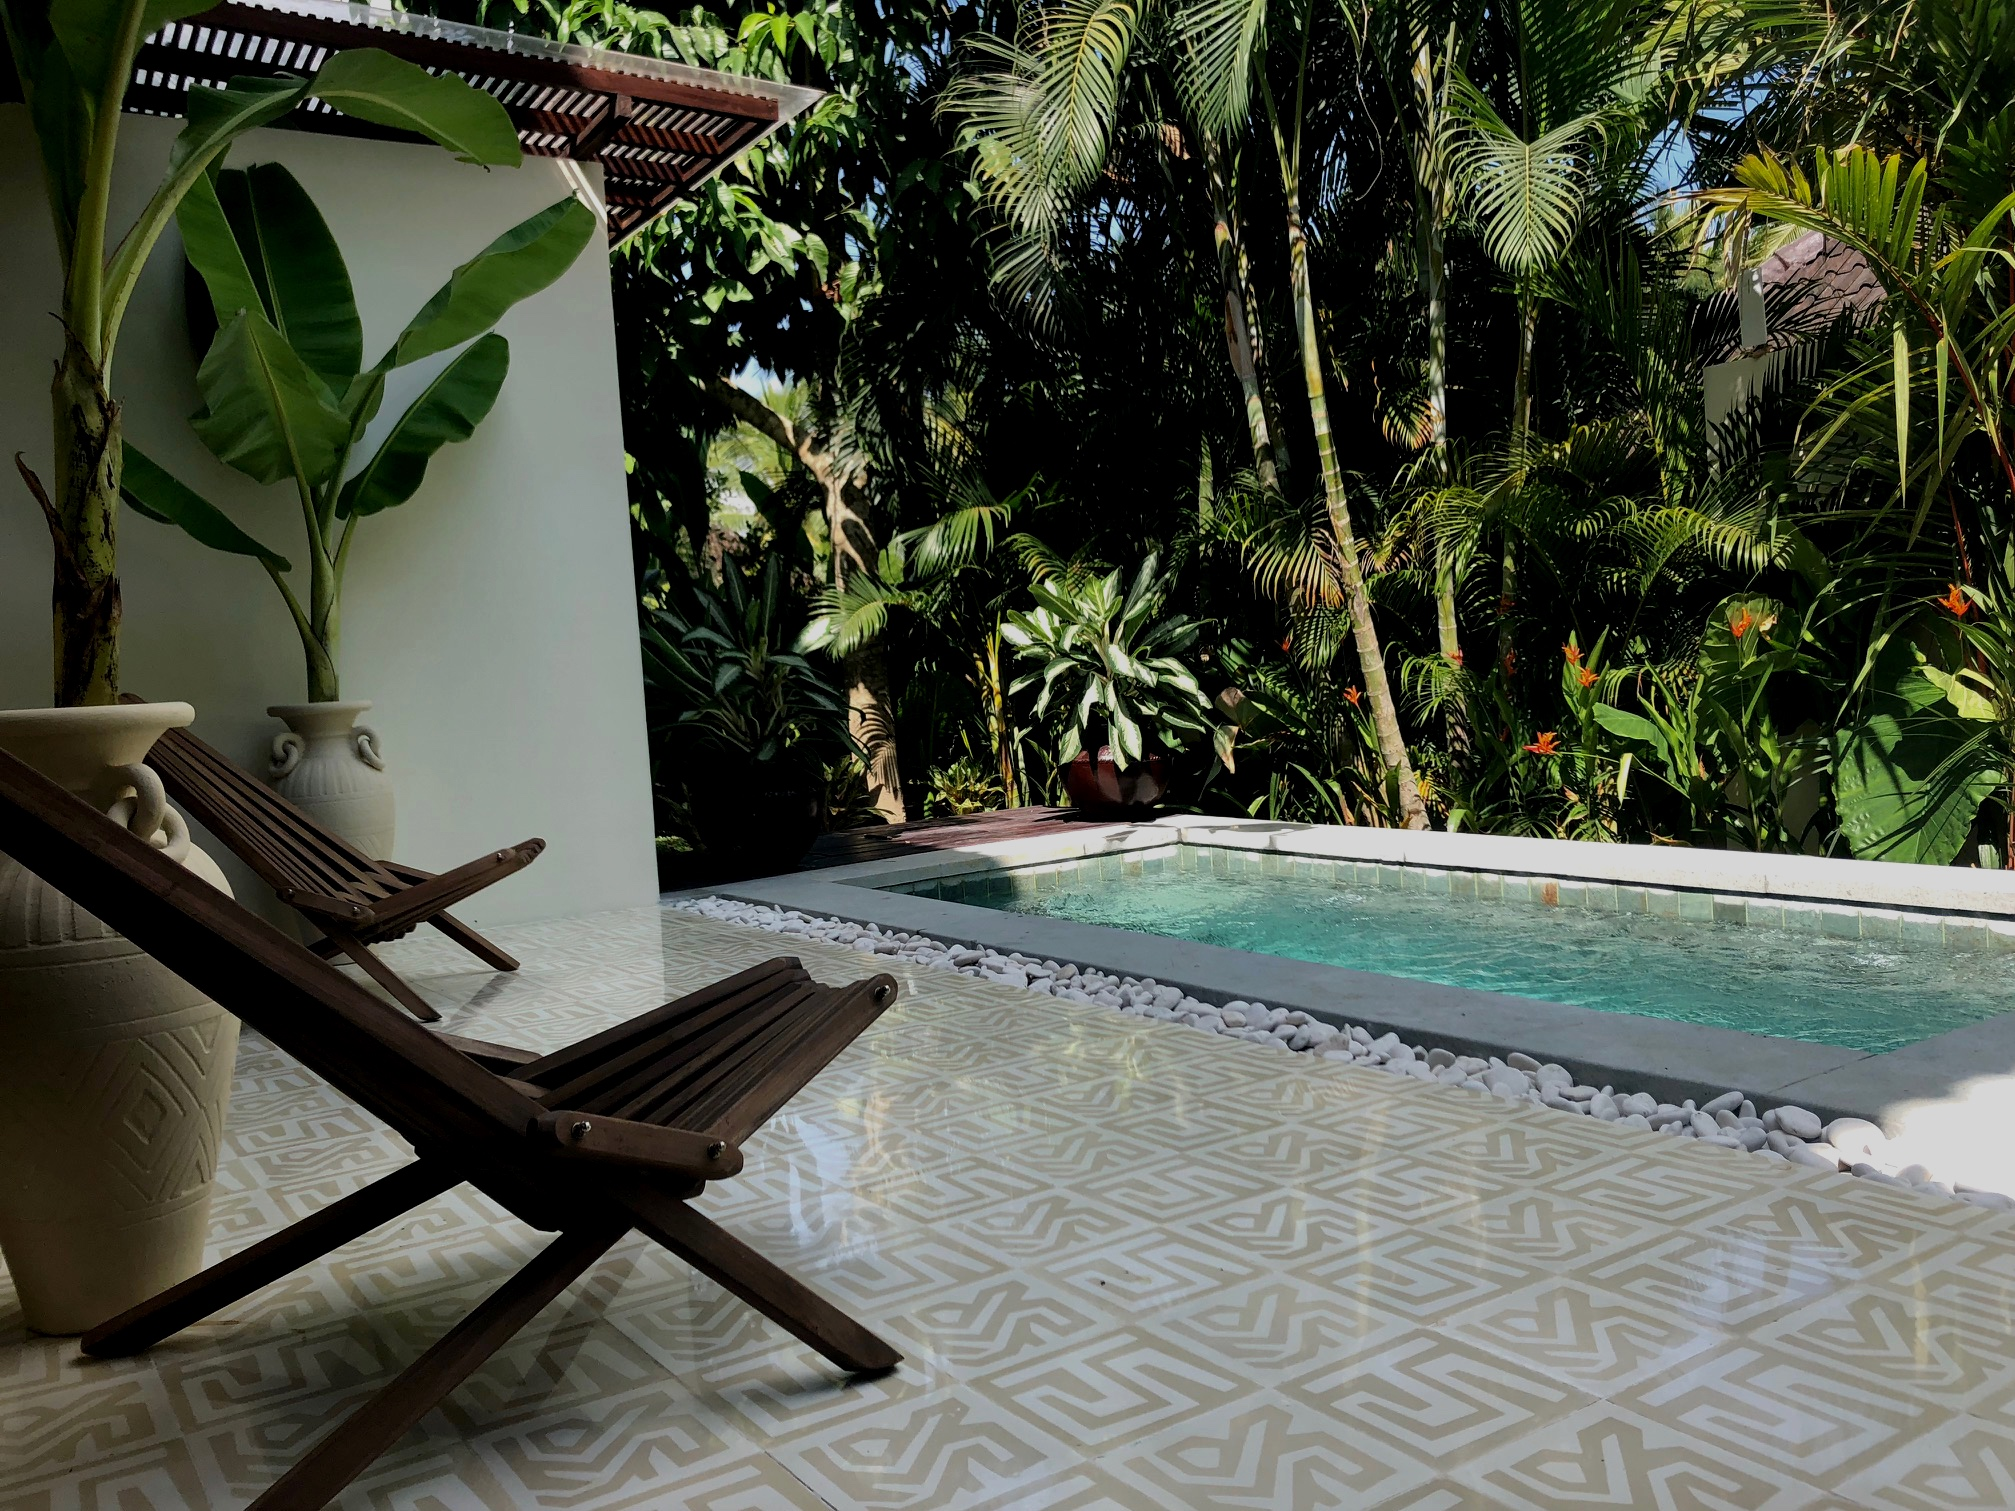 - Prince Pool Villa